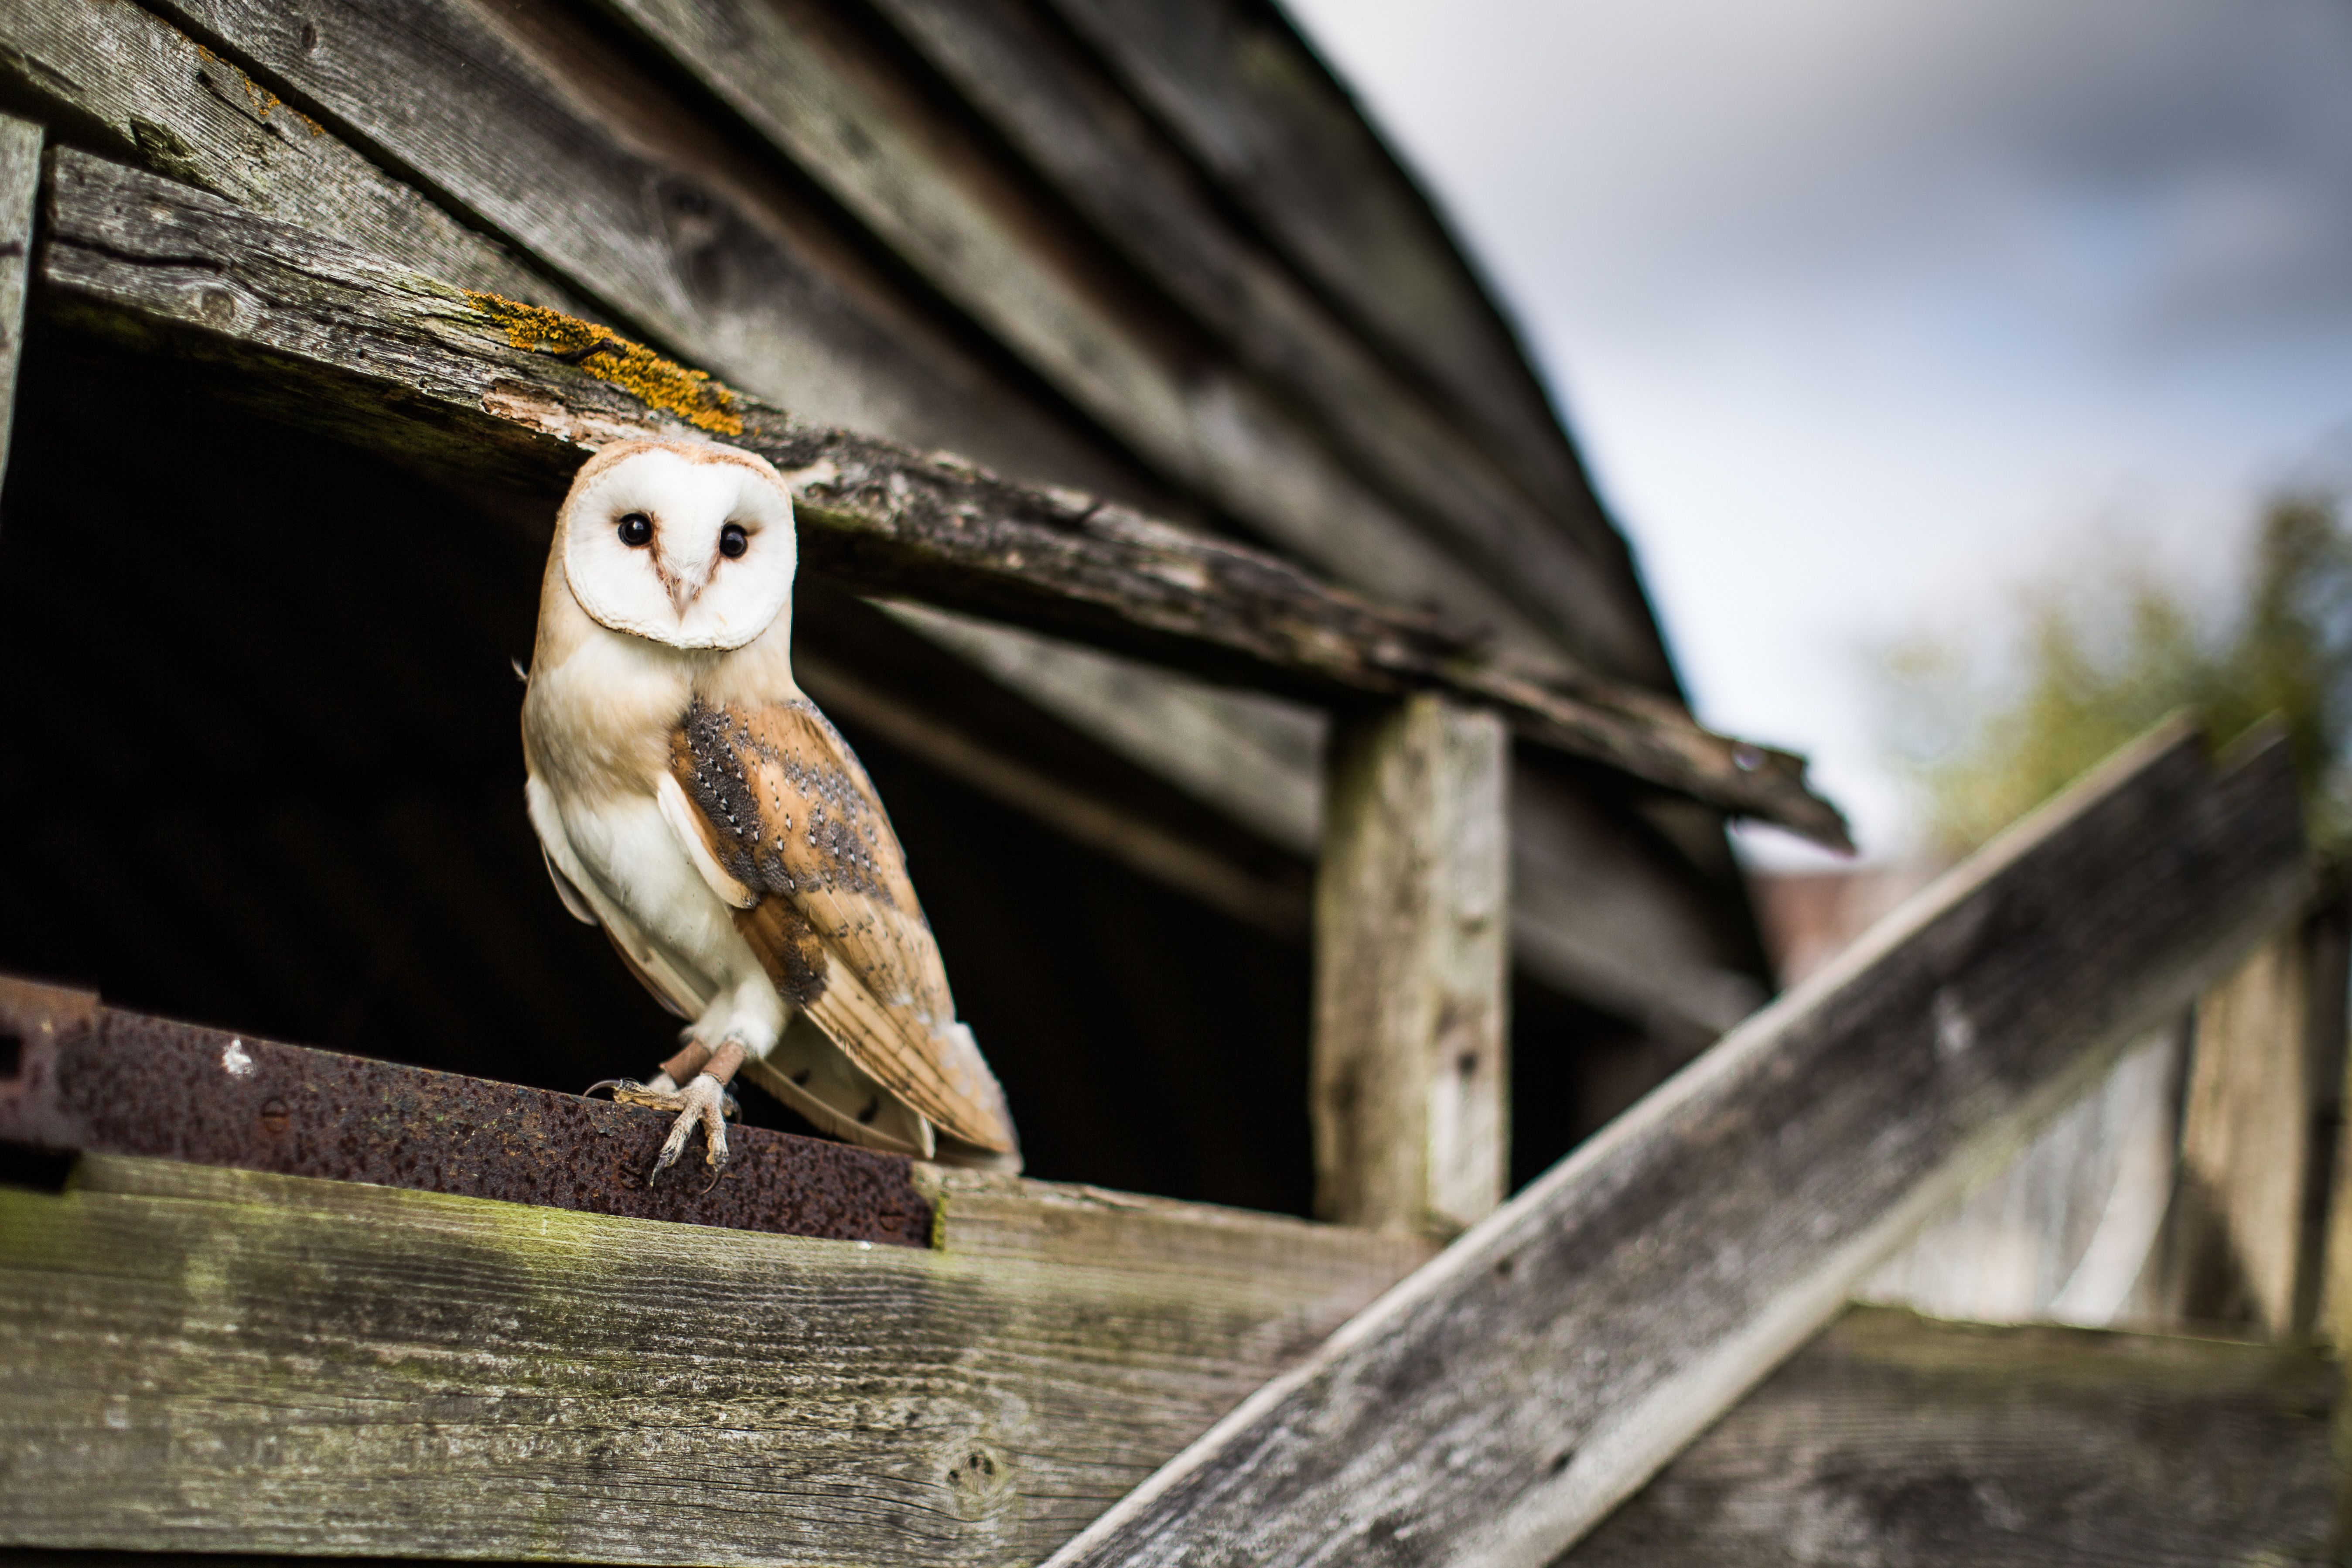 An owl alone